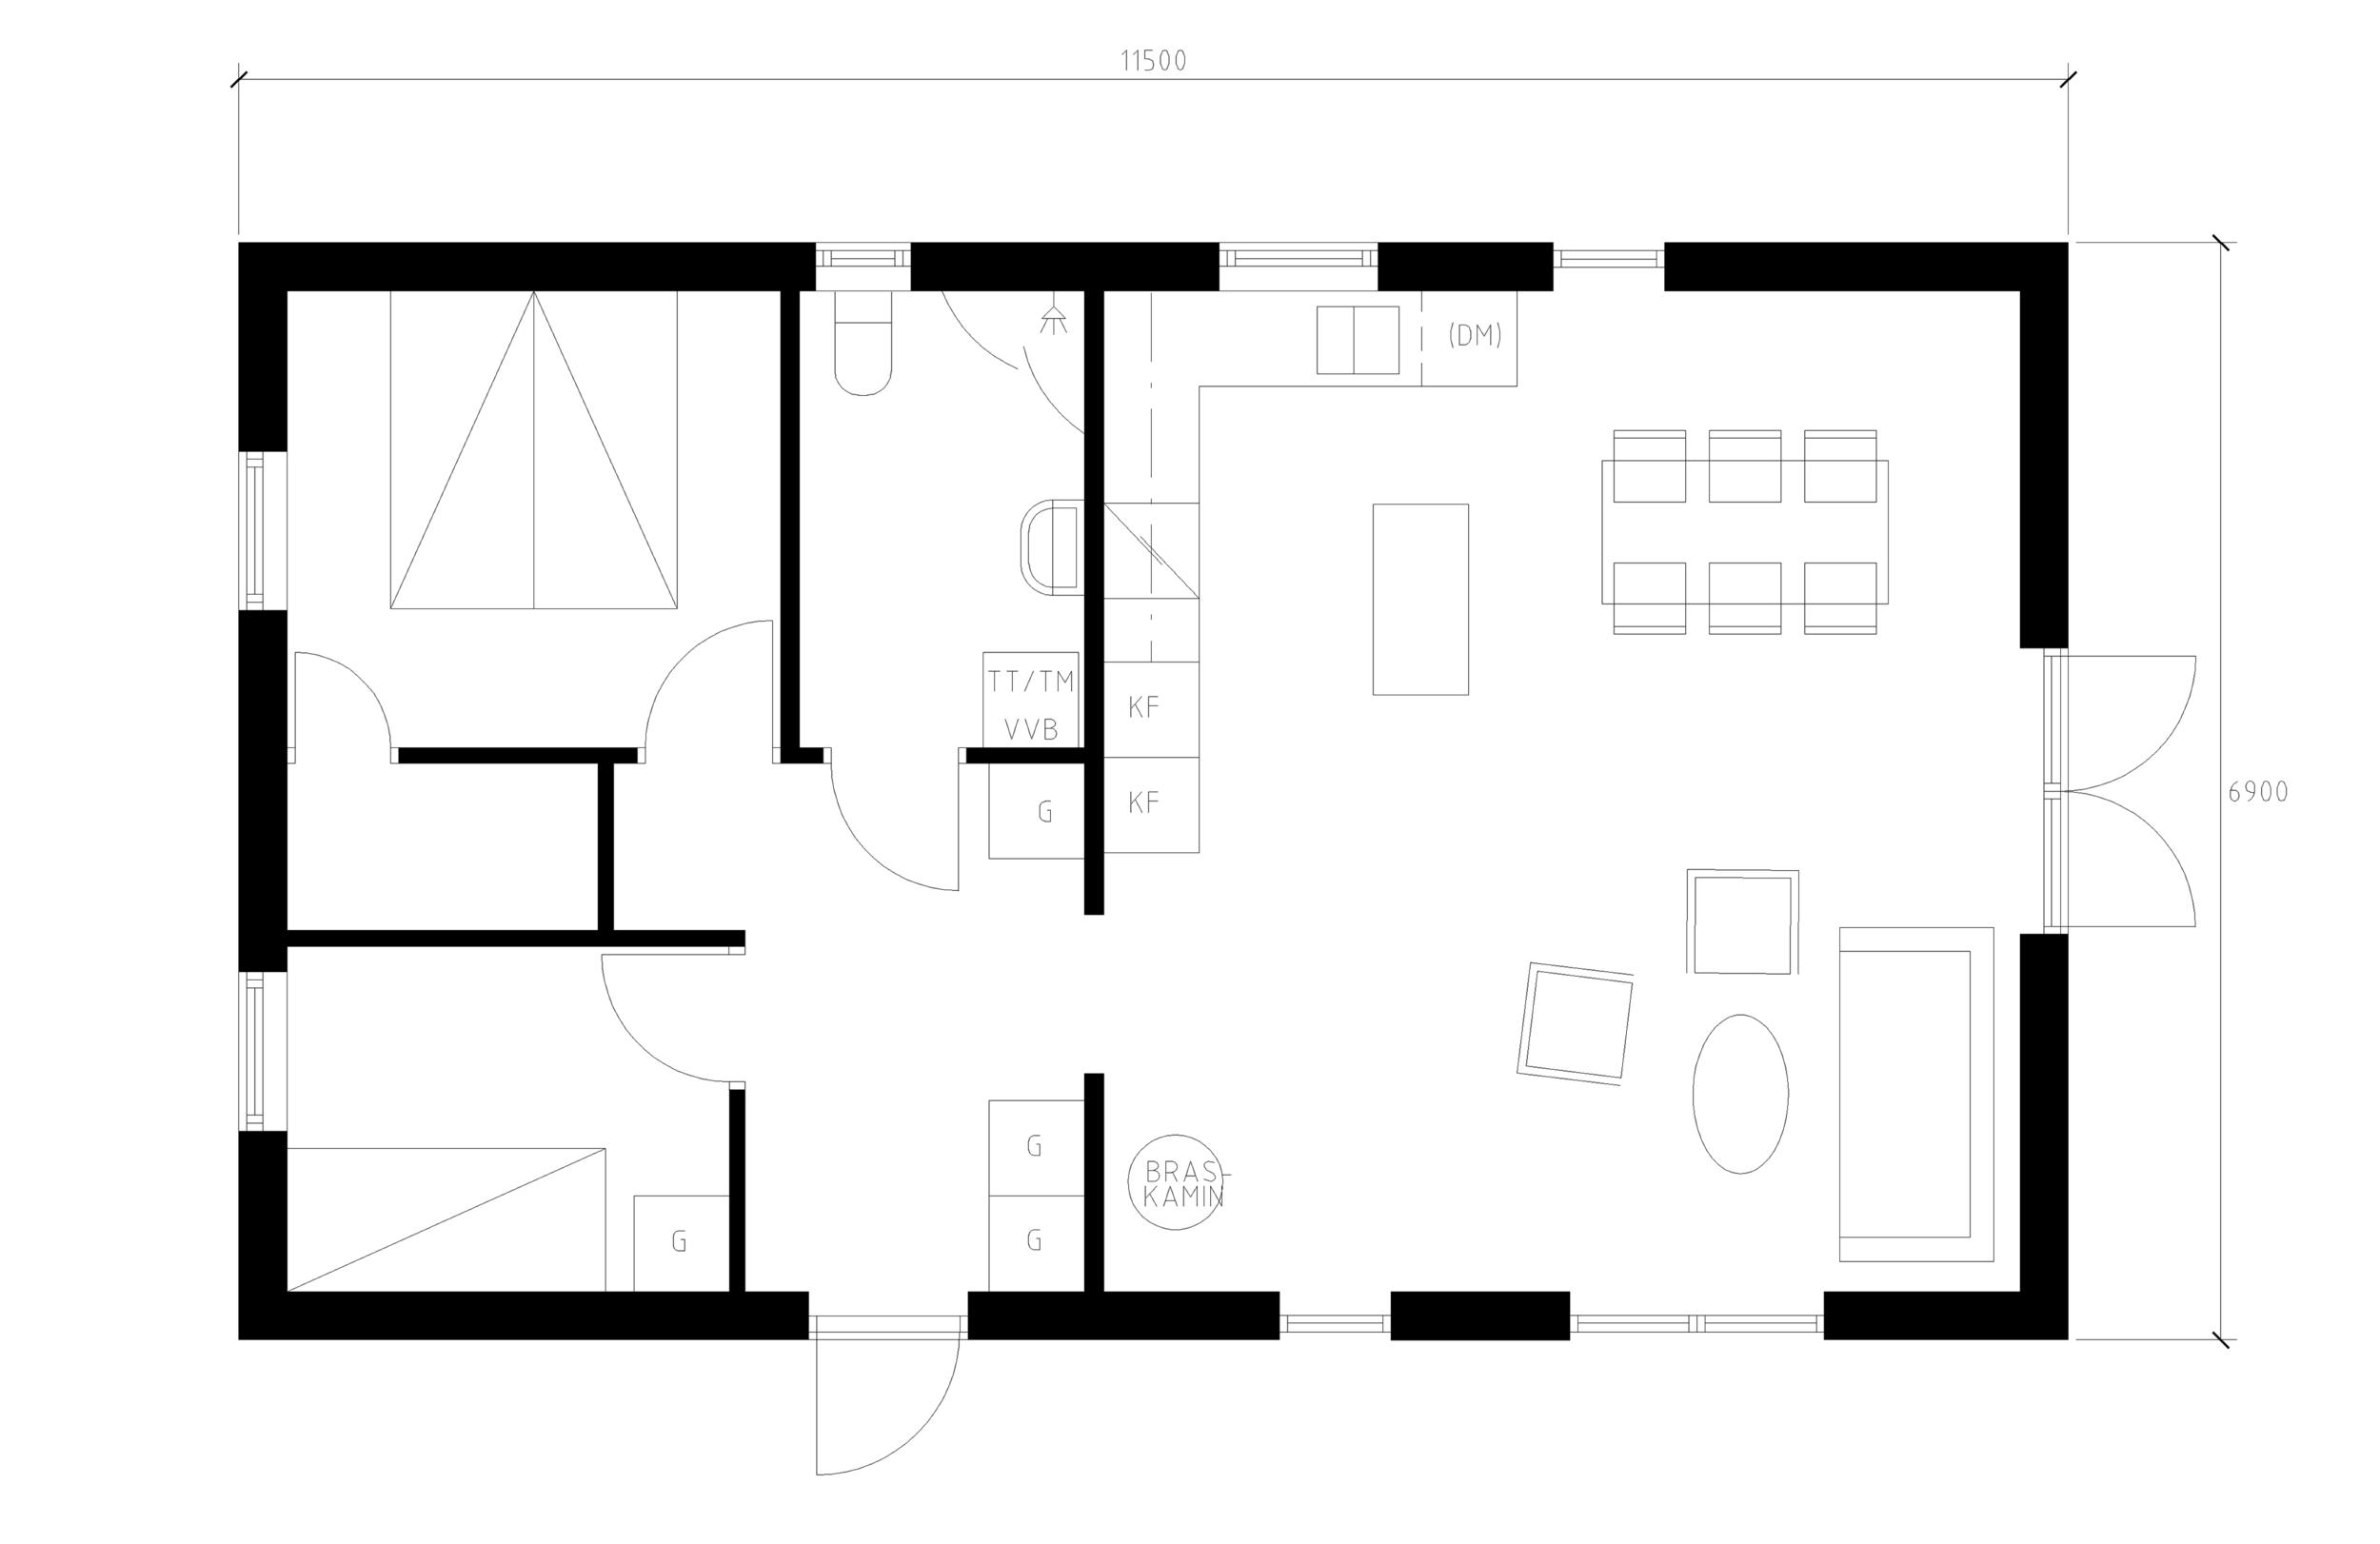 easy-house-fritidshus-80-planlösning.png